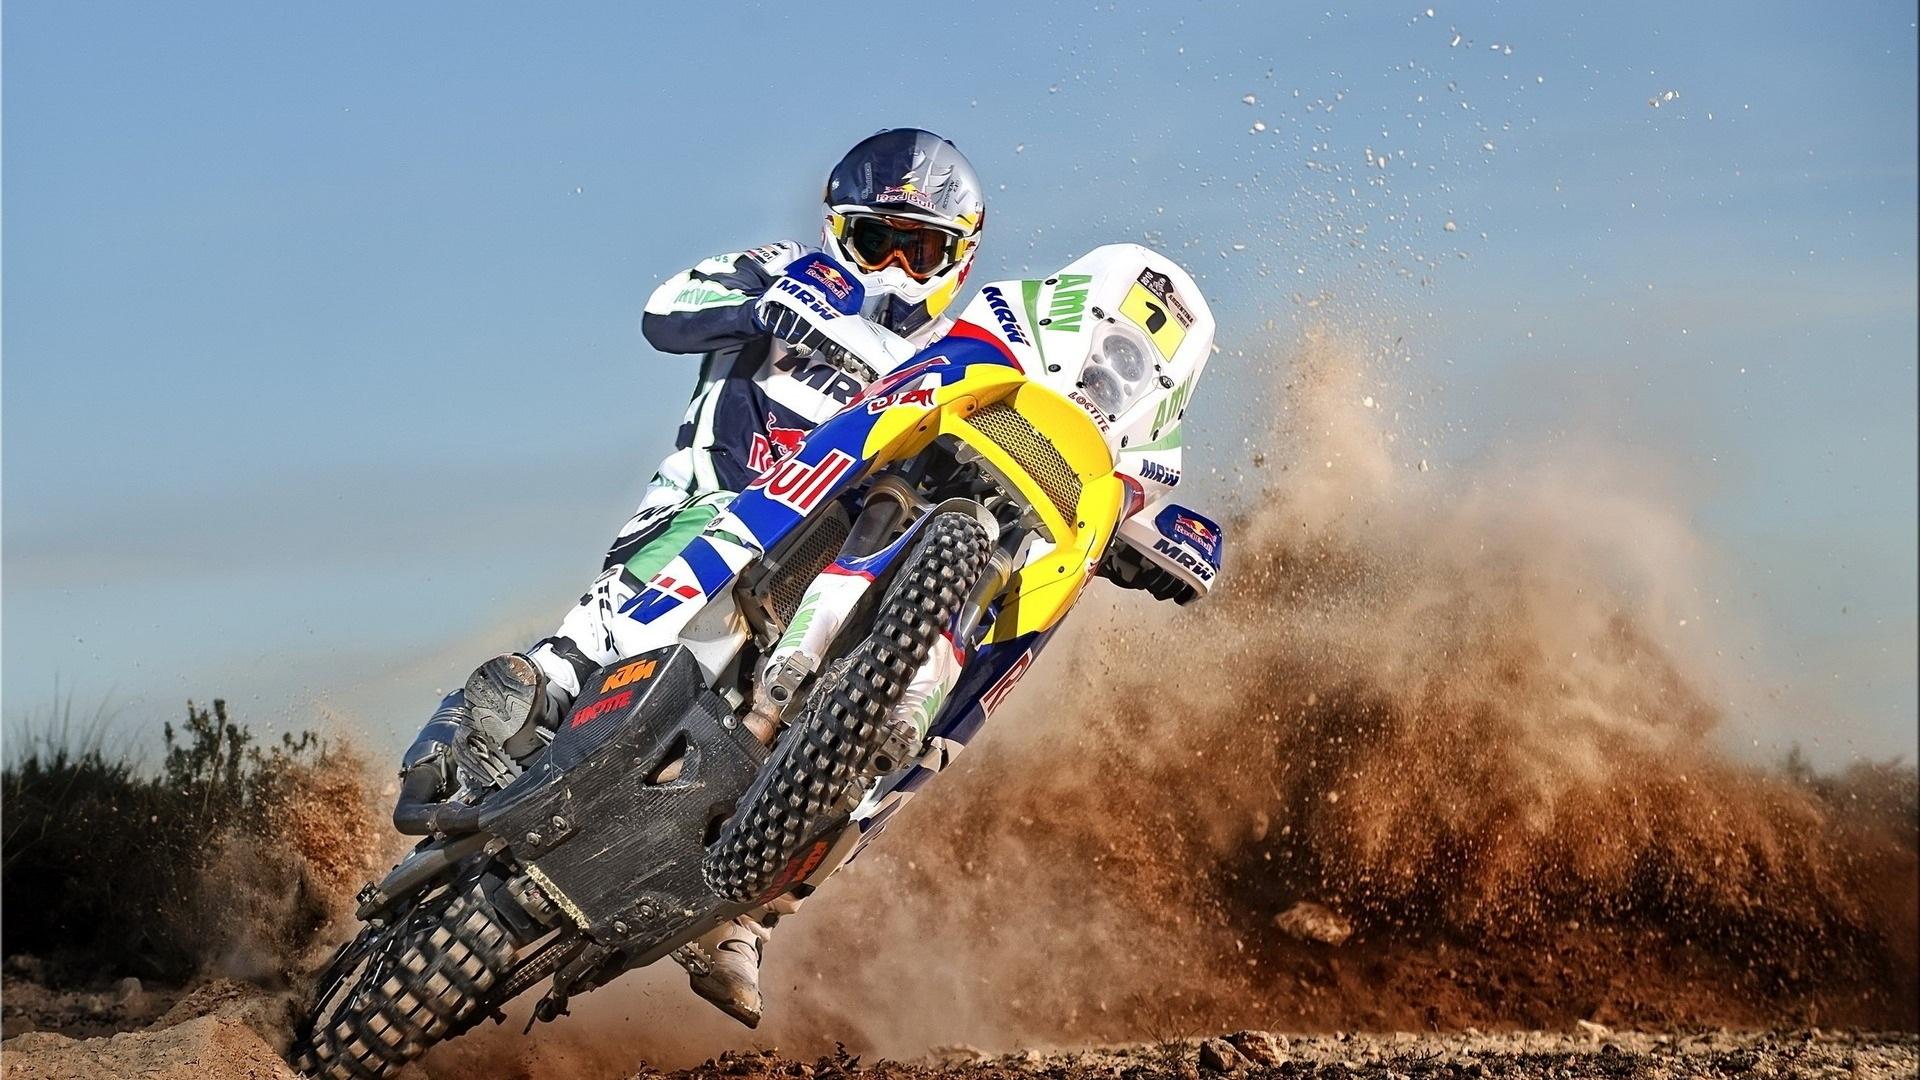 Pics Photos - Motorcycles Rally Dakar